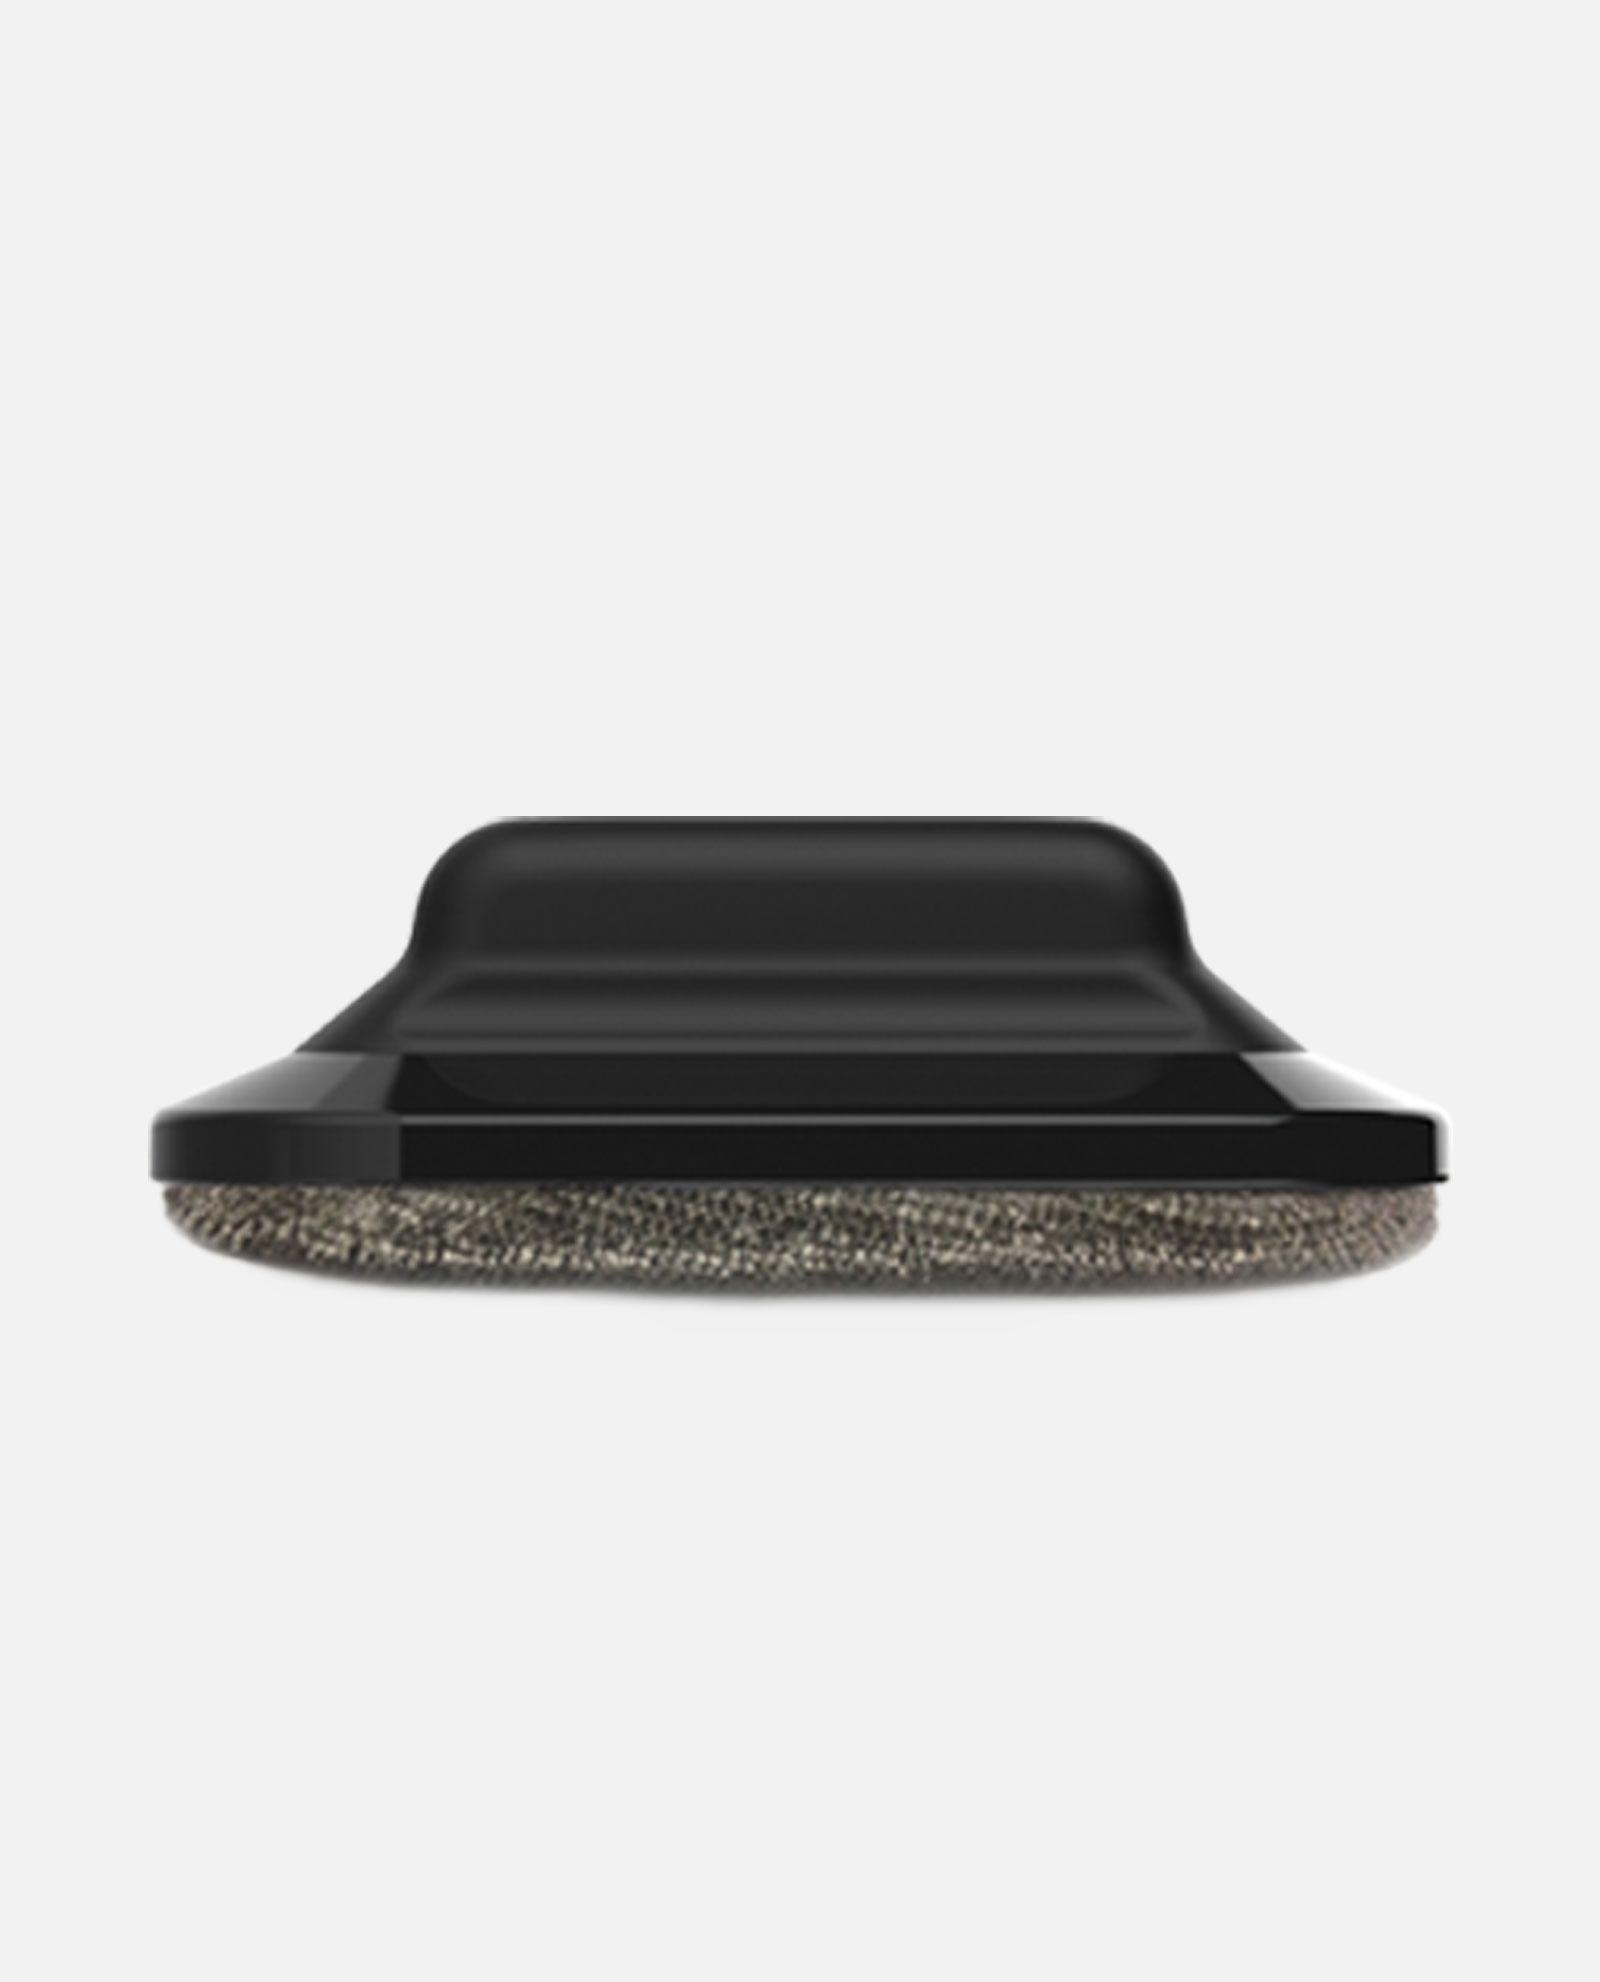 A410 001 Lint Brush – Vornado #6F675C